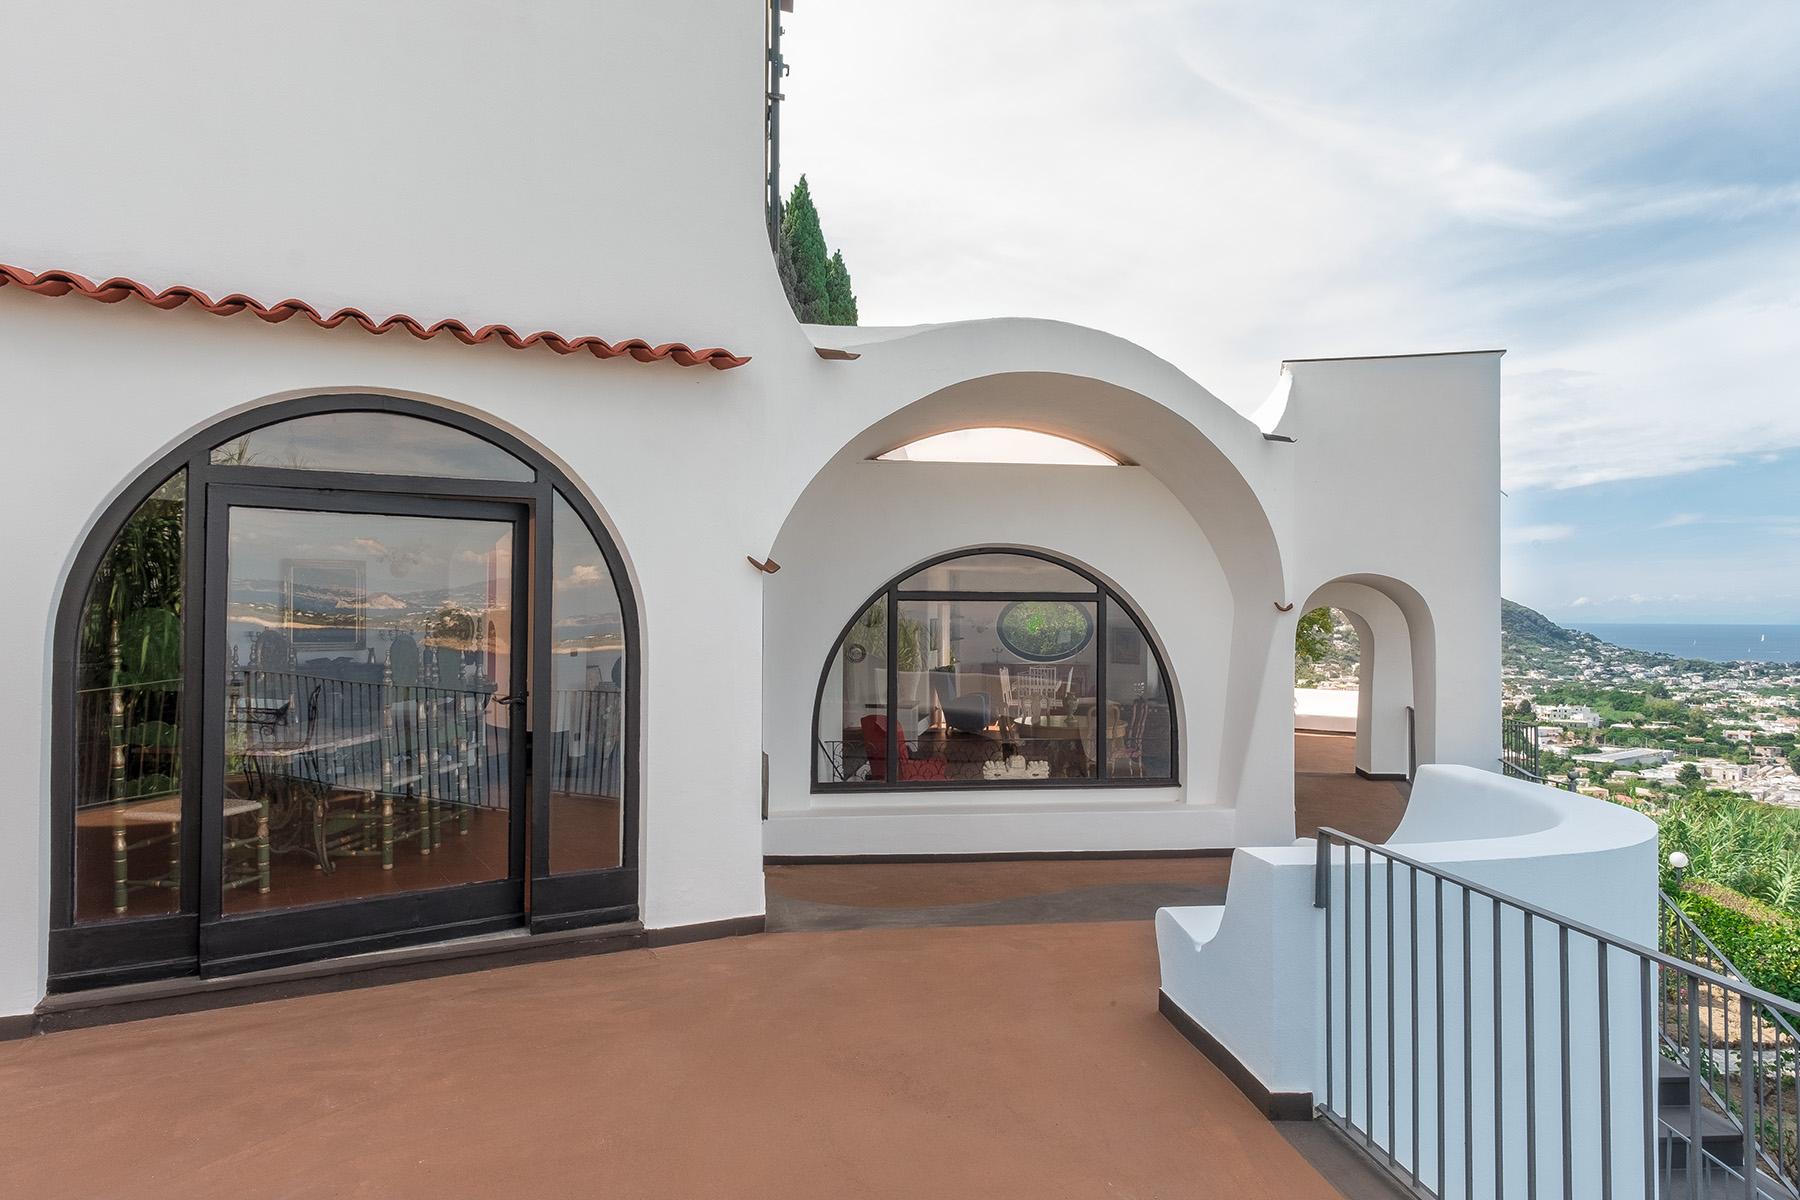 Villa in Vendita a Ischia: 5 locali, 500 mq - Foto 18